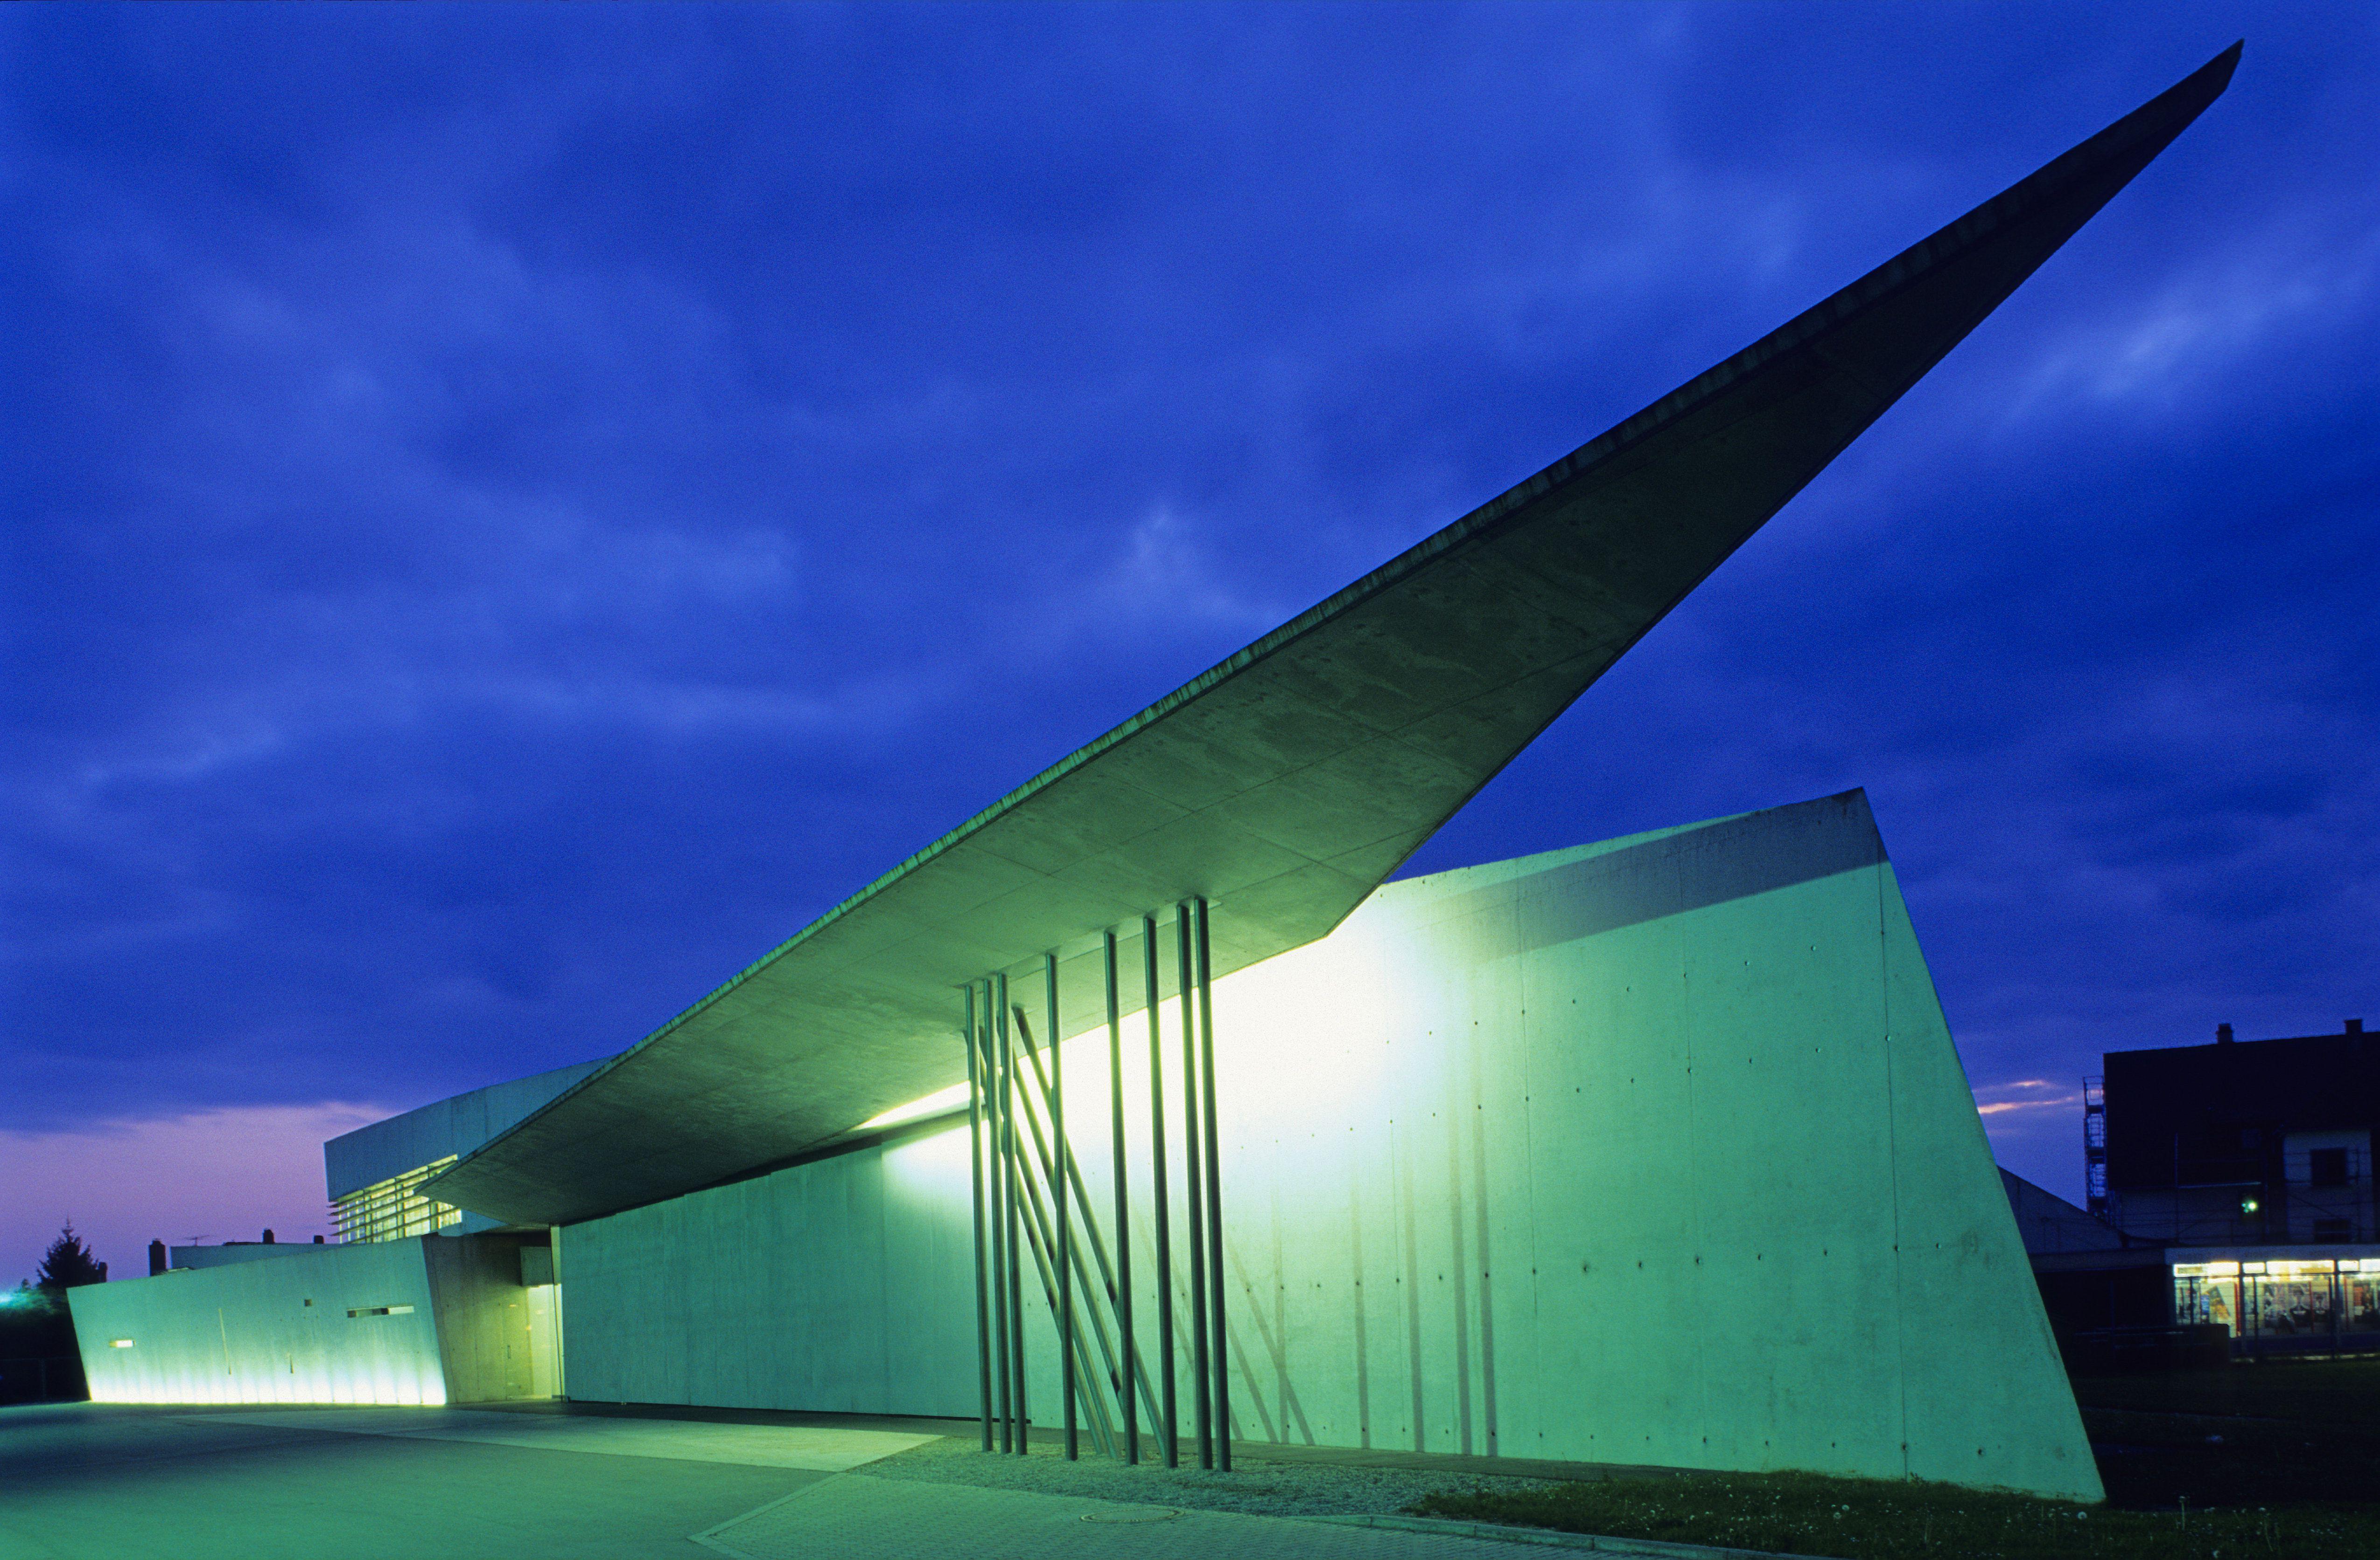 Zaha Hadid's angular Vitra Fire Station, Weil am Rhein, Germany, Built 1990 – 1993